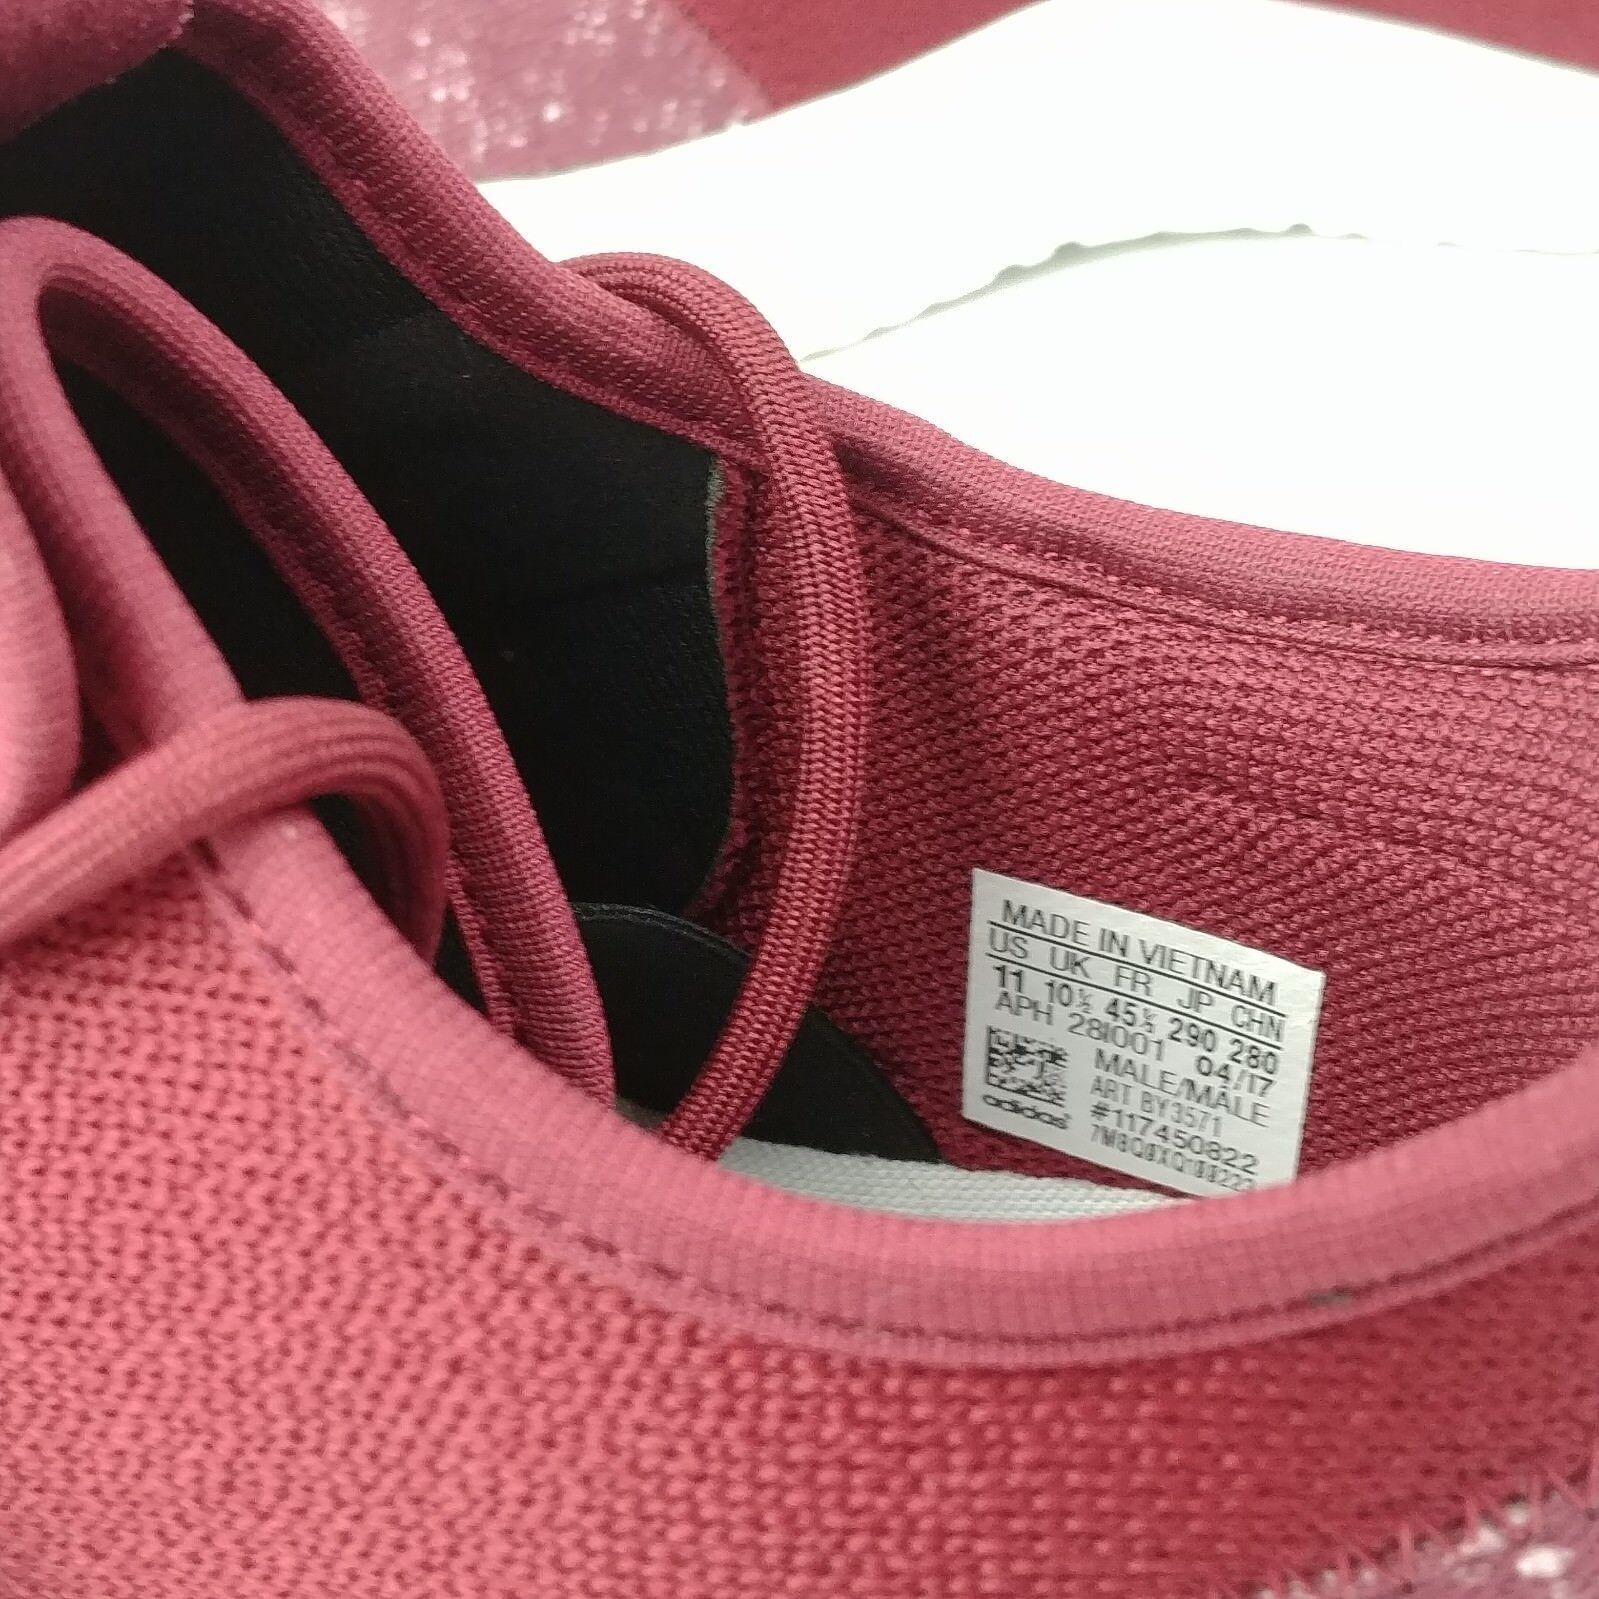 Adidas uomini tubulare, taglia 11 noi uomini Adidas ombra by3571 ortholite 527c0f